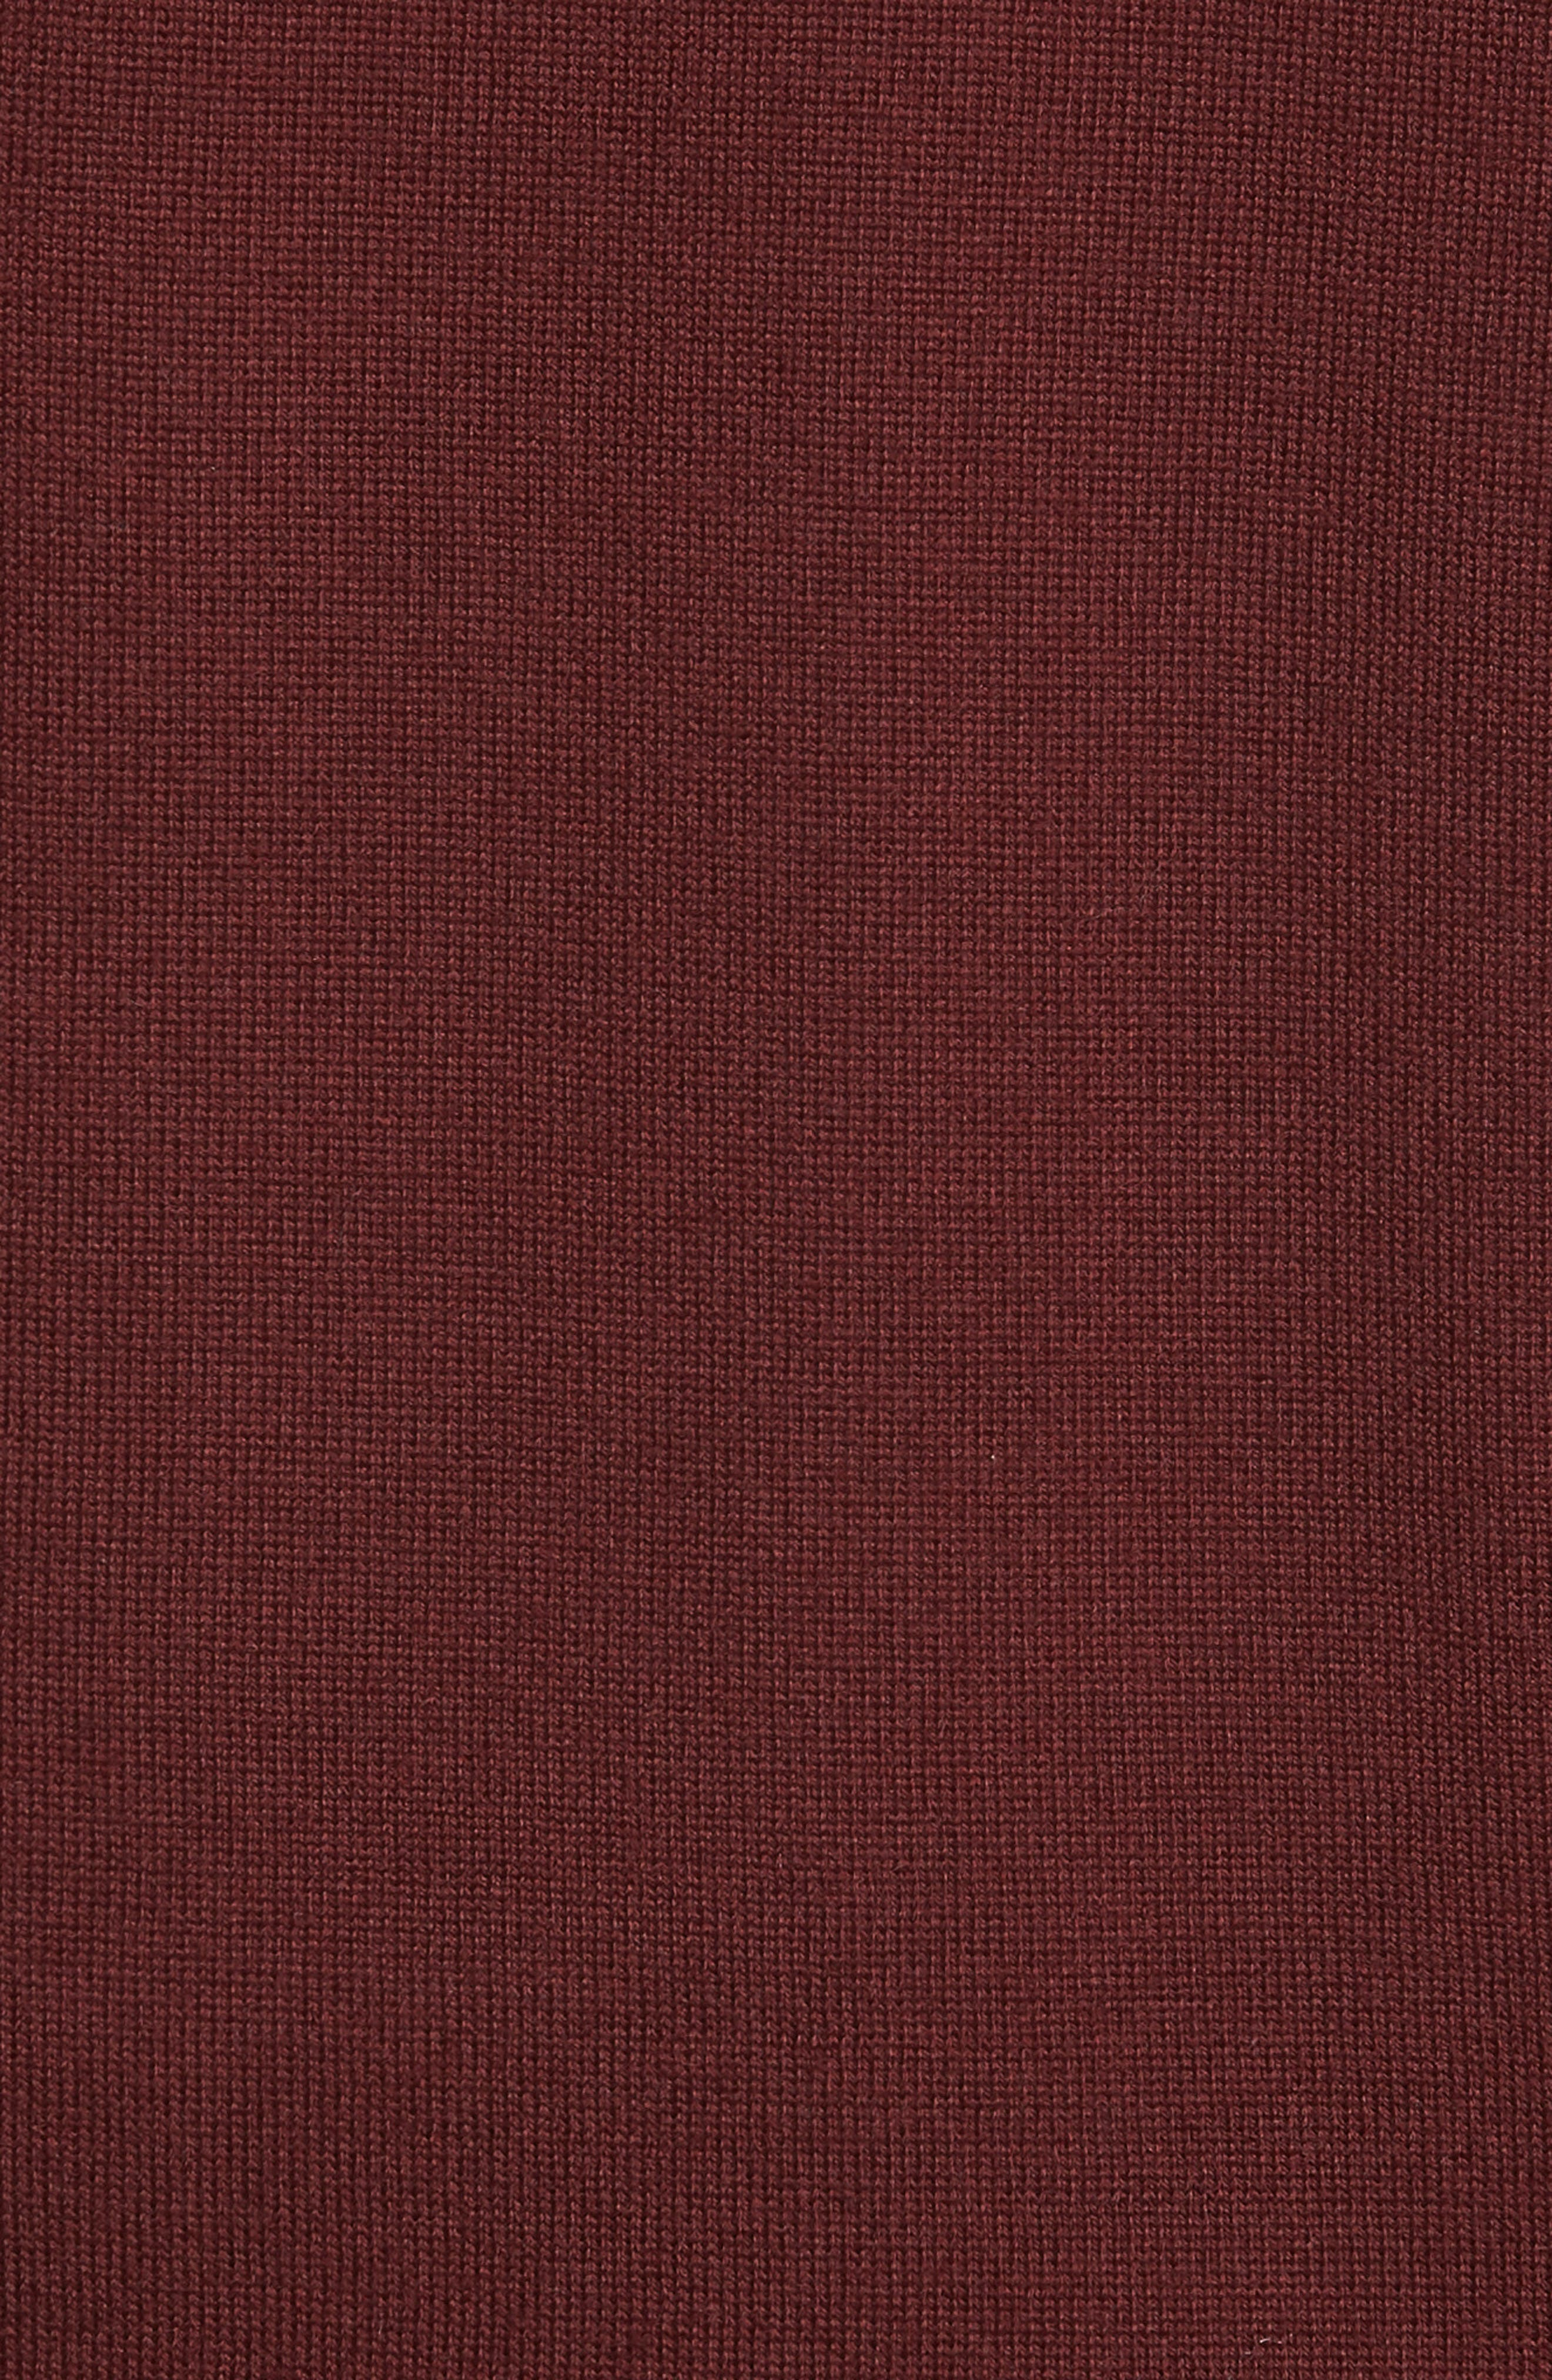 Merino Button Front Sweater Vest,                             Alternate thumbnail 5, color,                             930